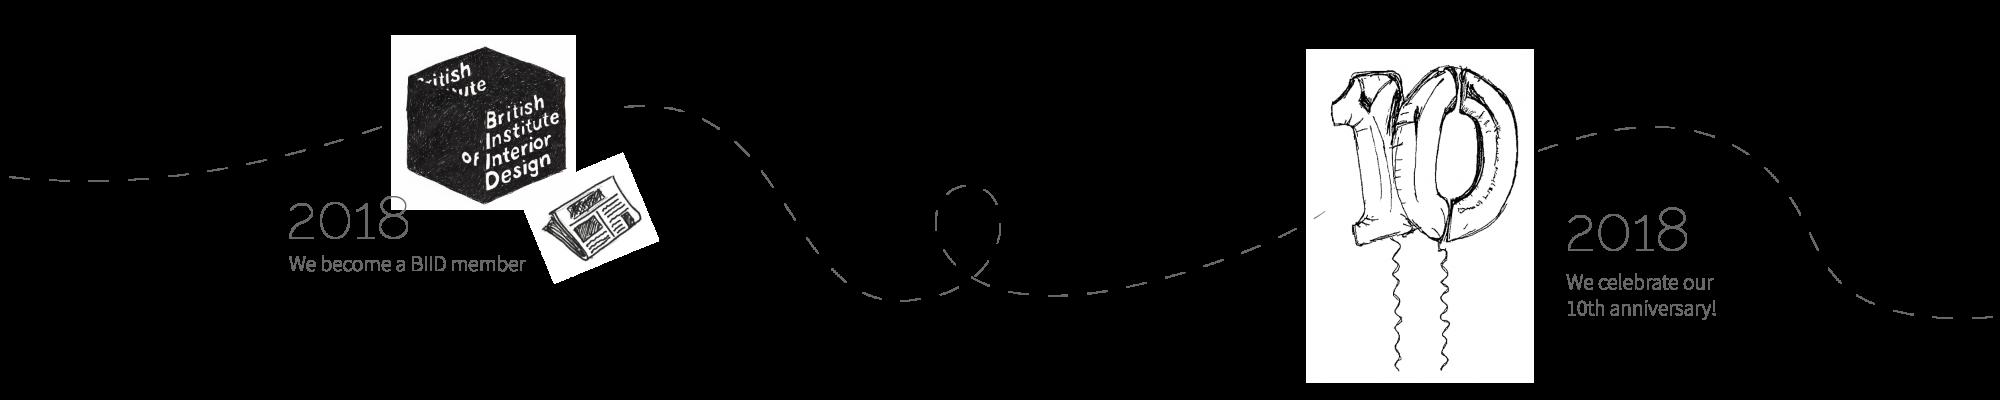 BHT053 Carousel Timeline 6-06